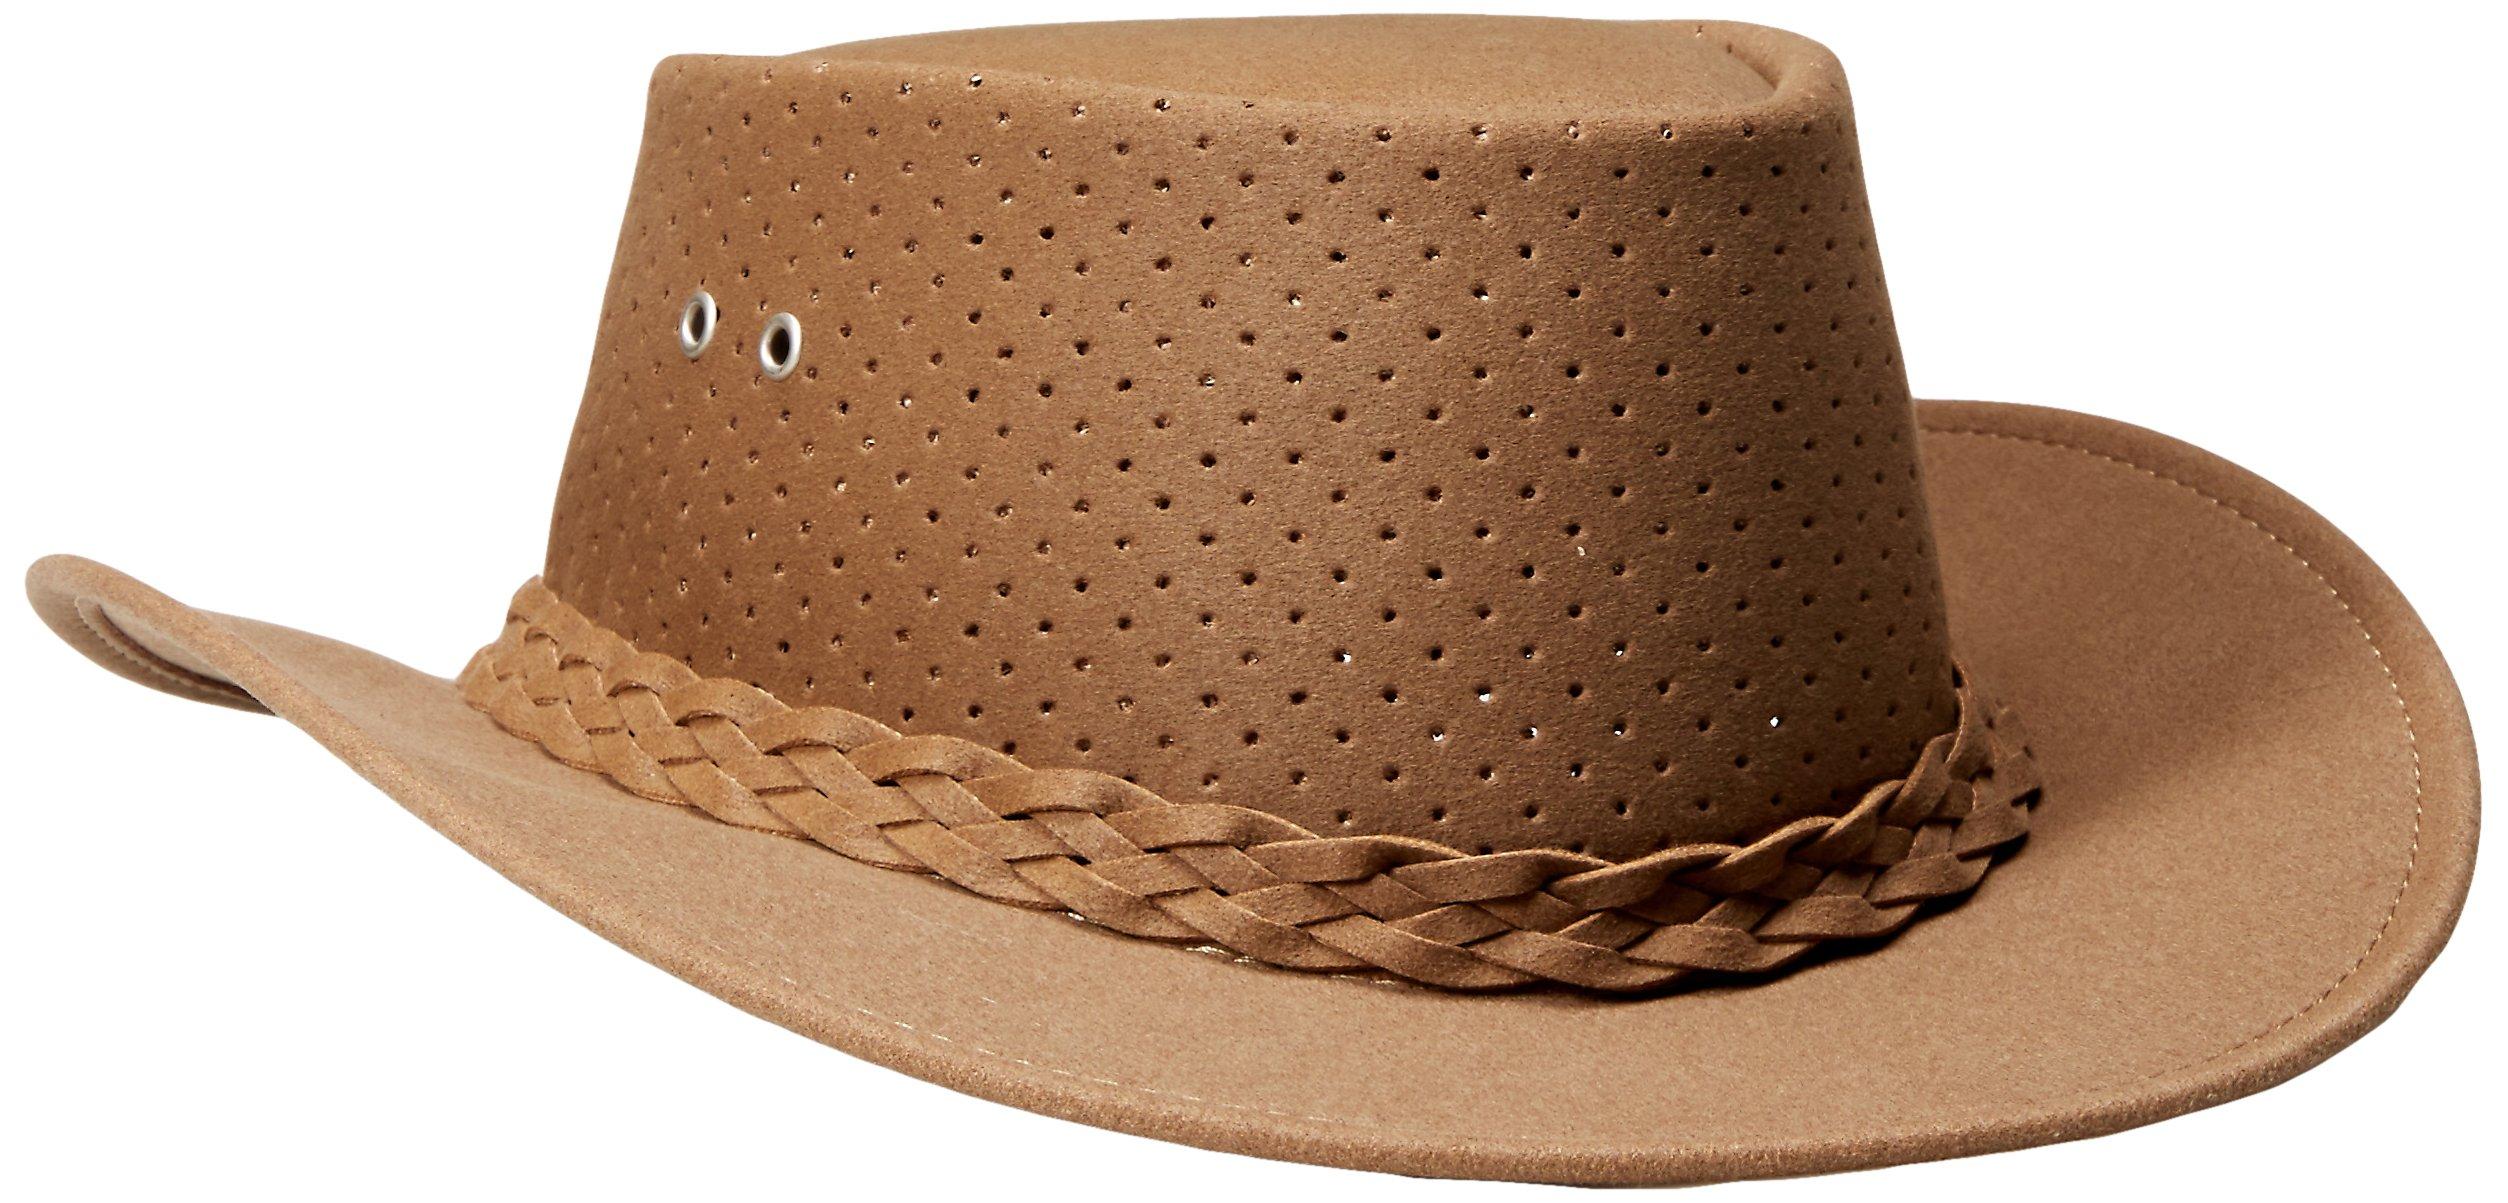 Aussie Chiller Bushie Perforated Hats Tan Large by Aussie Chiller